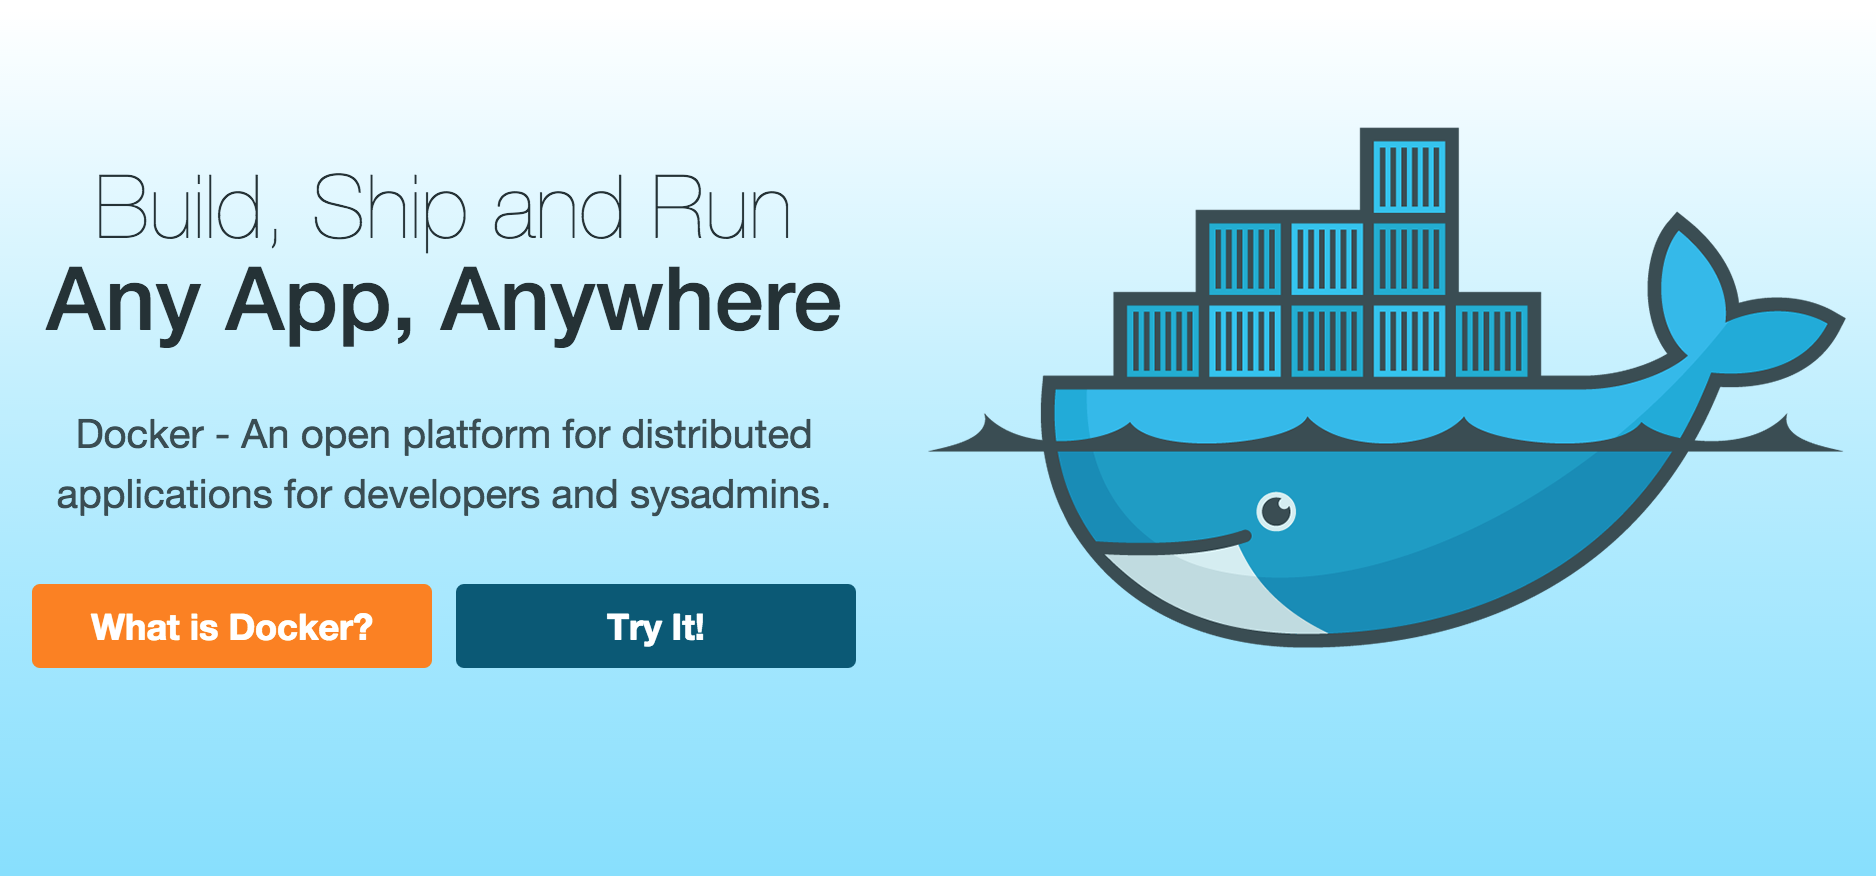 Docker Build, Ship, and Run Any App, Anywhere (With